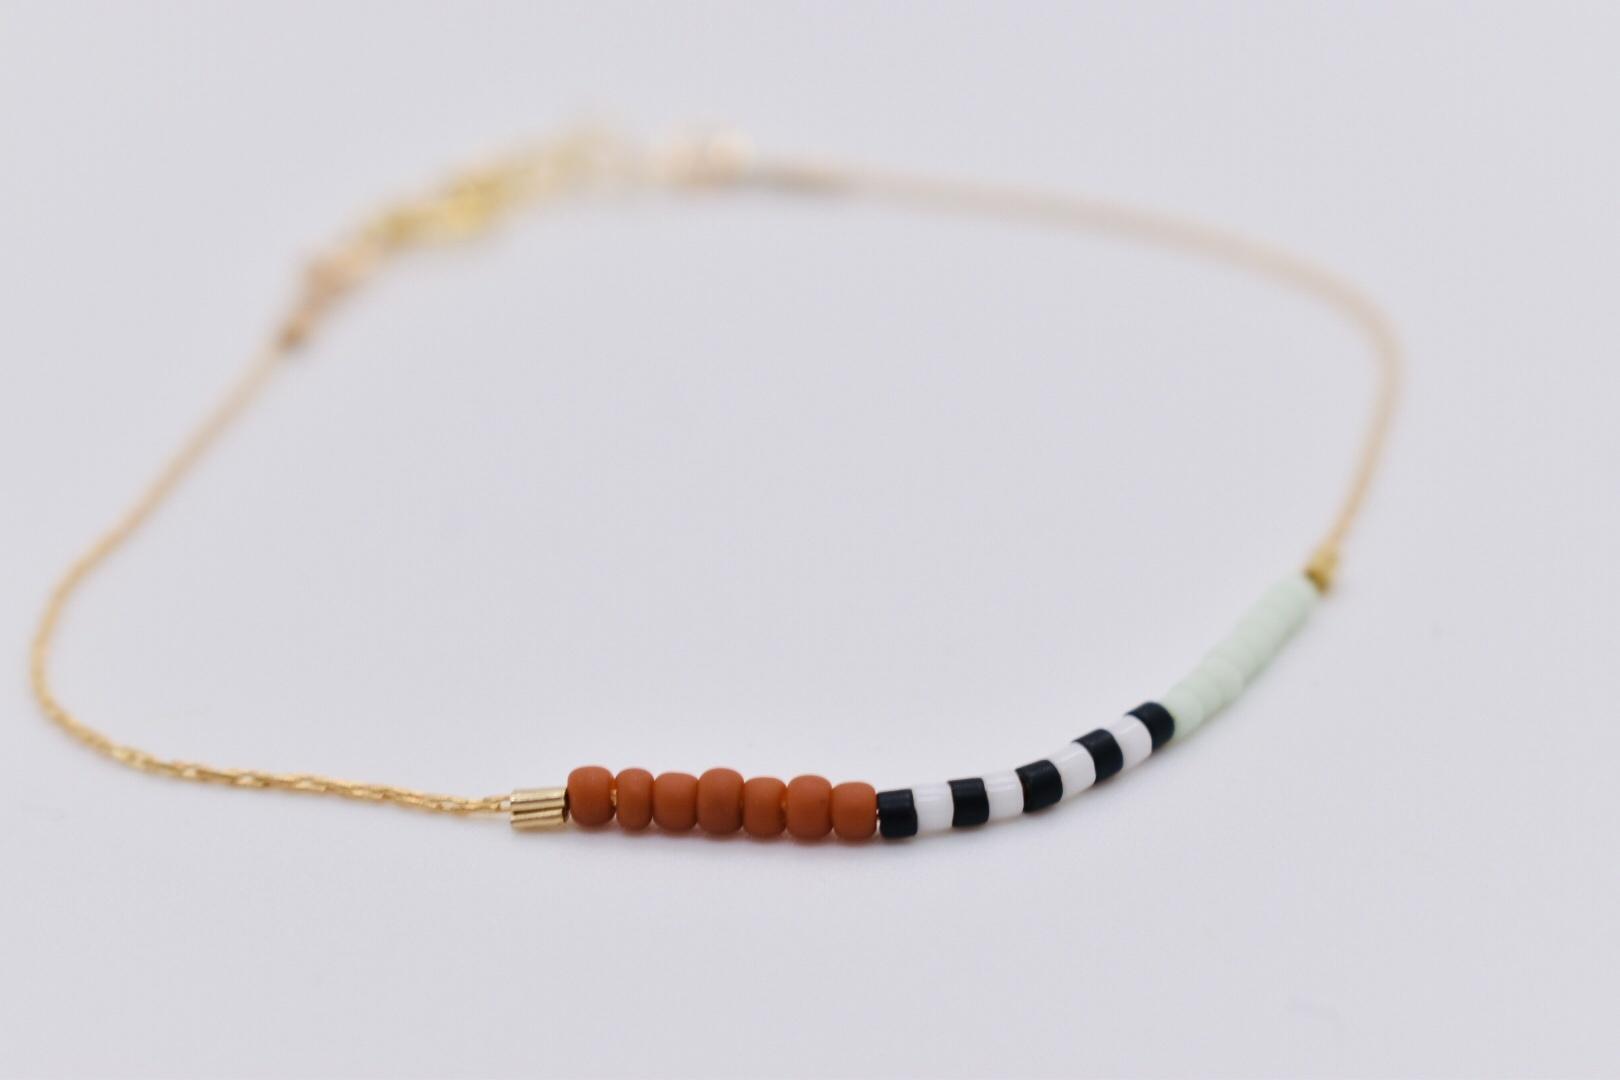 Son of a Sailor - SOAS SOAS JE - Septima Bracelet,  Terra Cotta